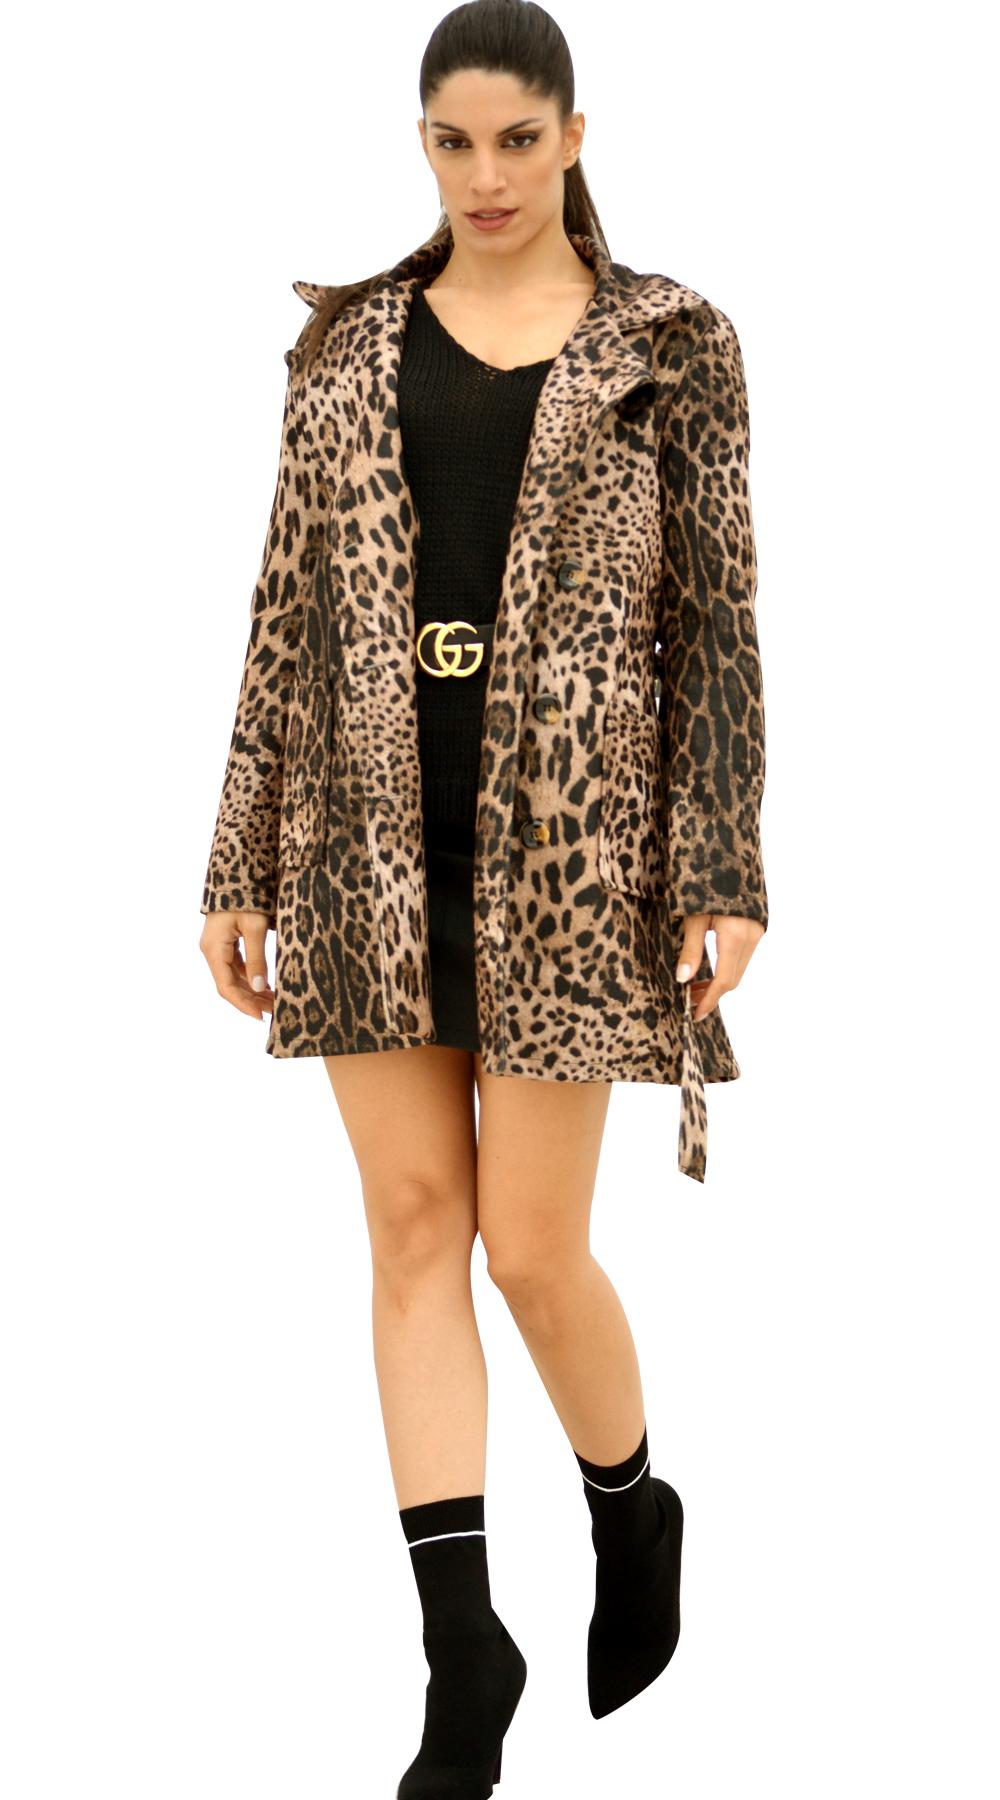 927cda6bea11 Καπαρτινέ Παλτό Leopard με κουμπιά και τσέπες